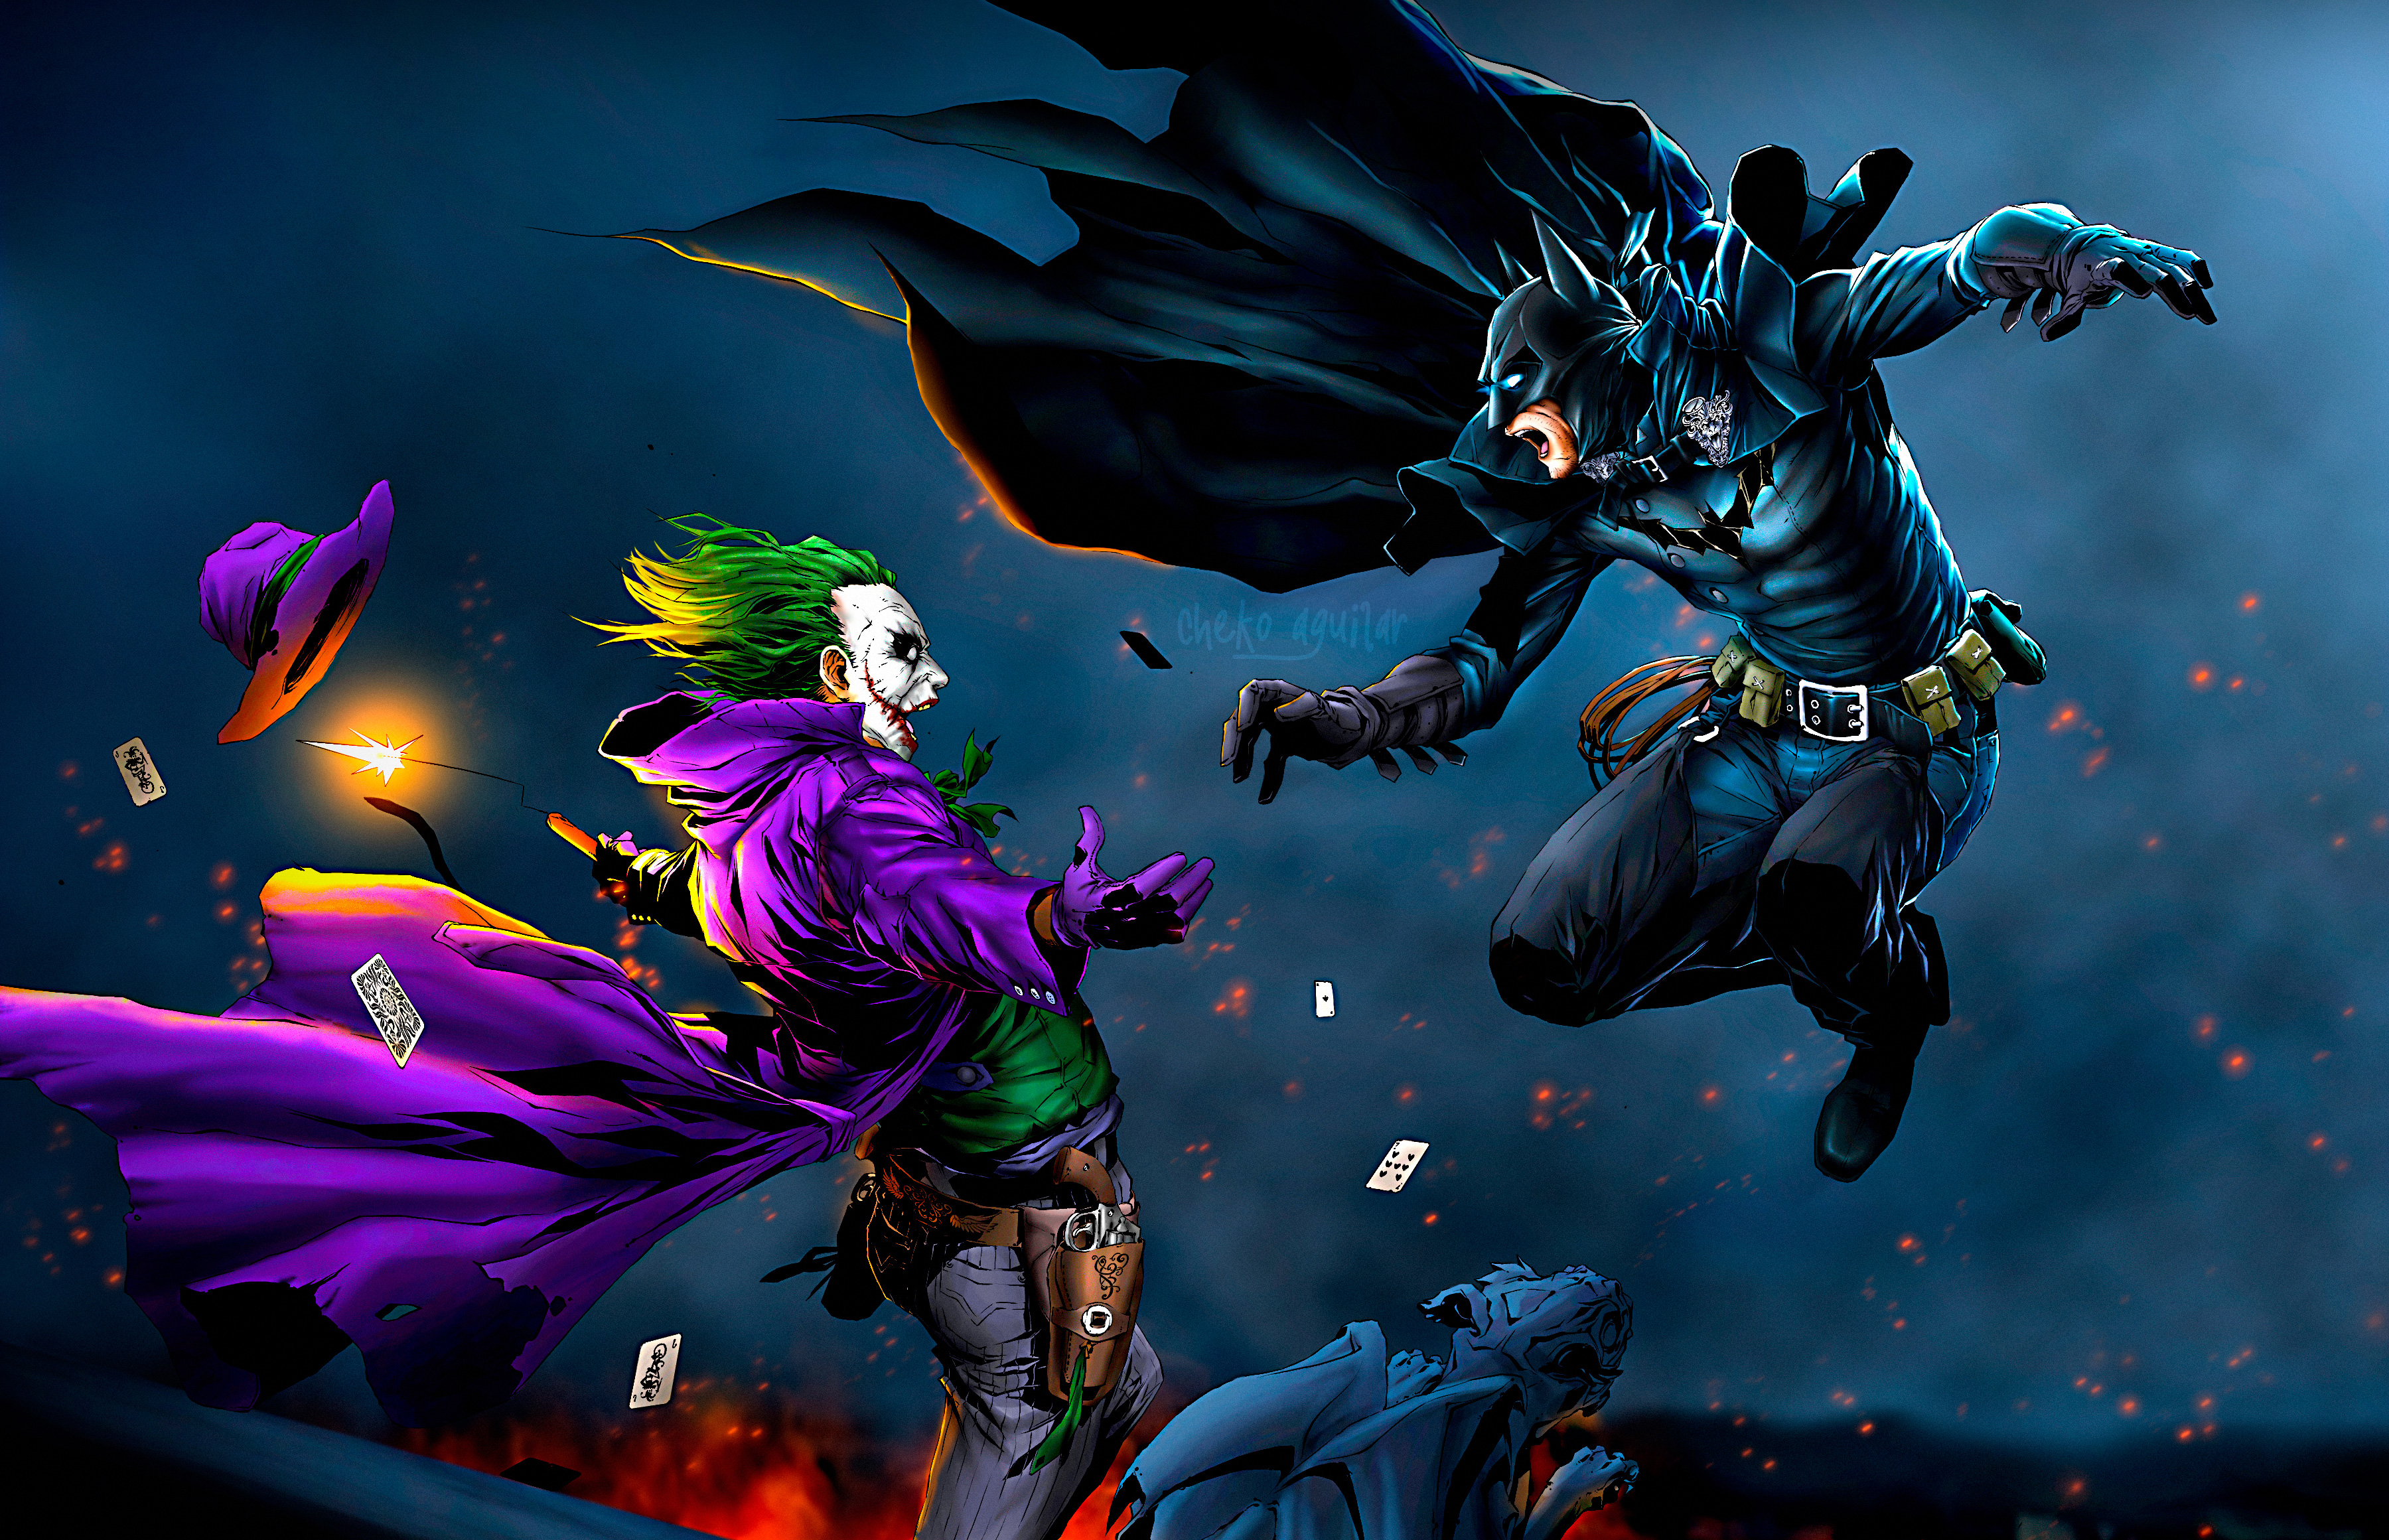 Batman vs joker hd superheroes 4k wallpapers images for Joker wallpaper 4k